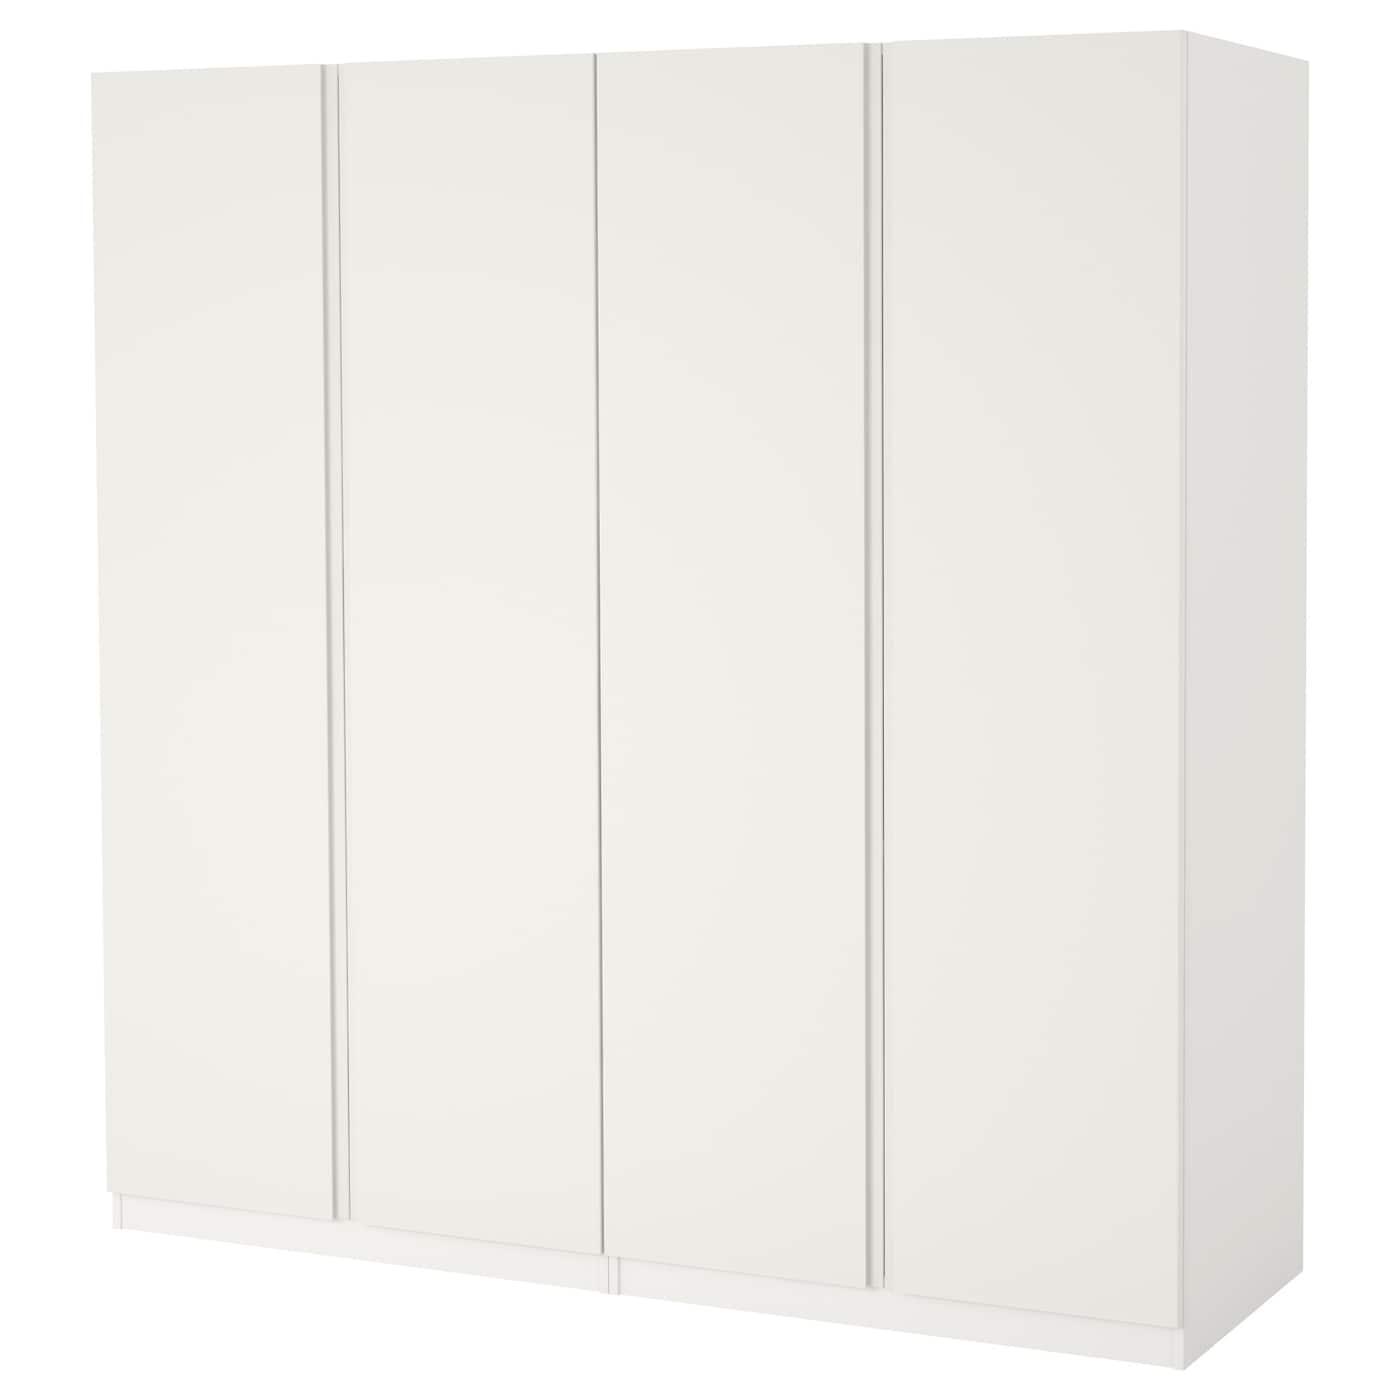 Pax Wardrobe White Vikanes White 200 X 60 X 201 Cm Ikea